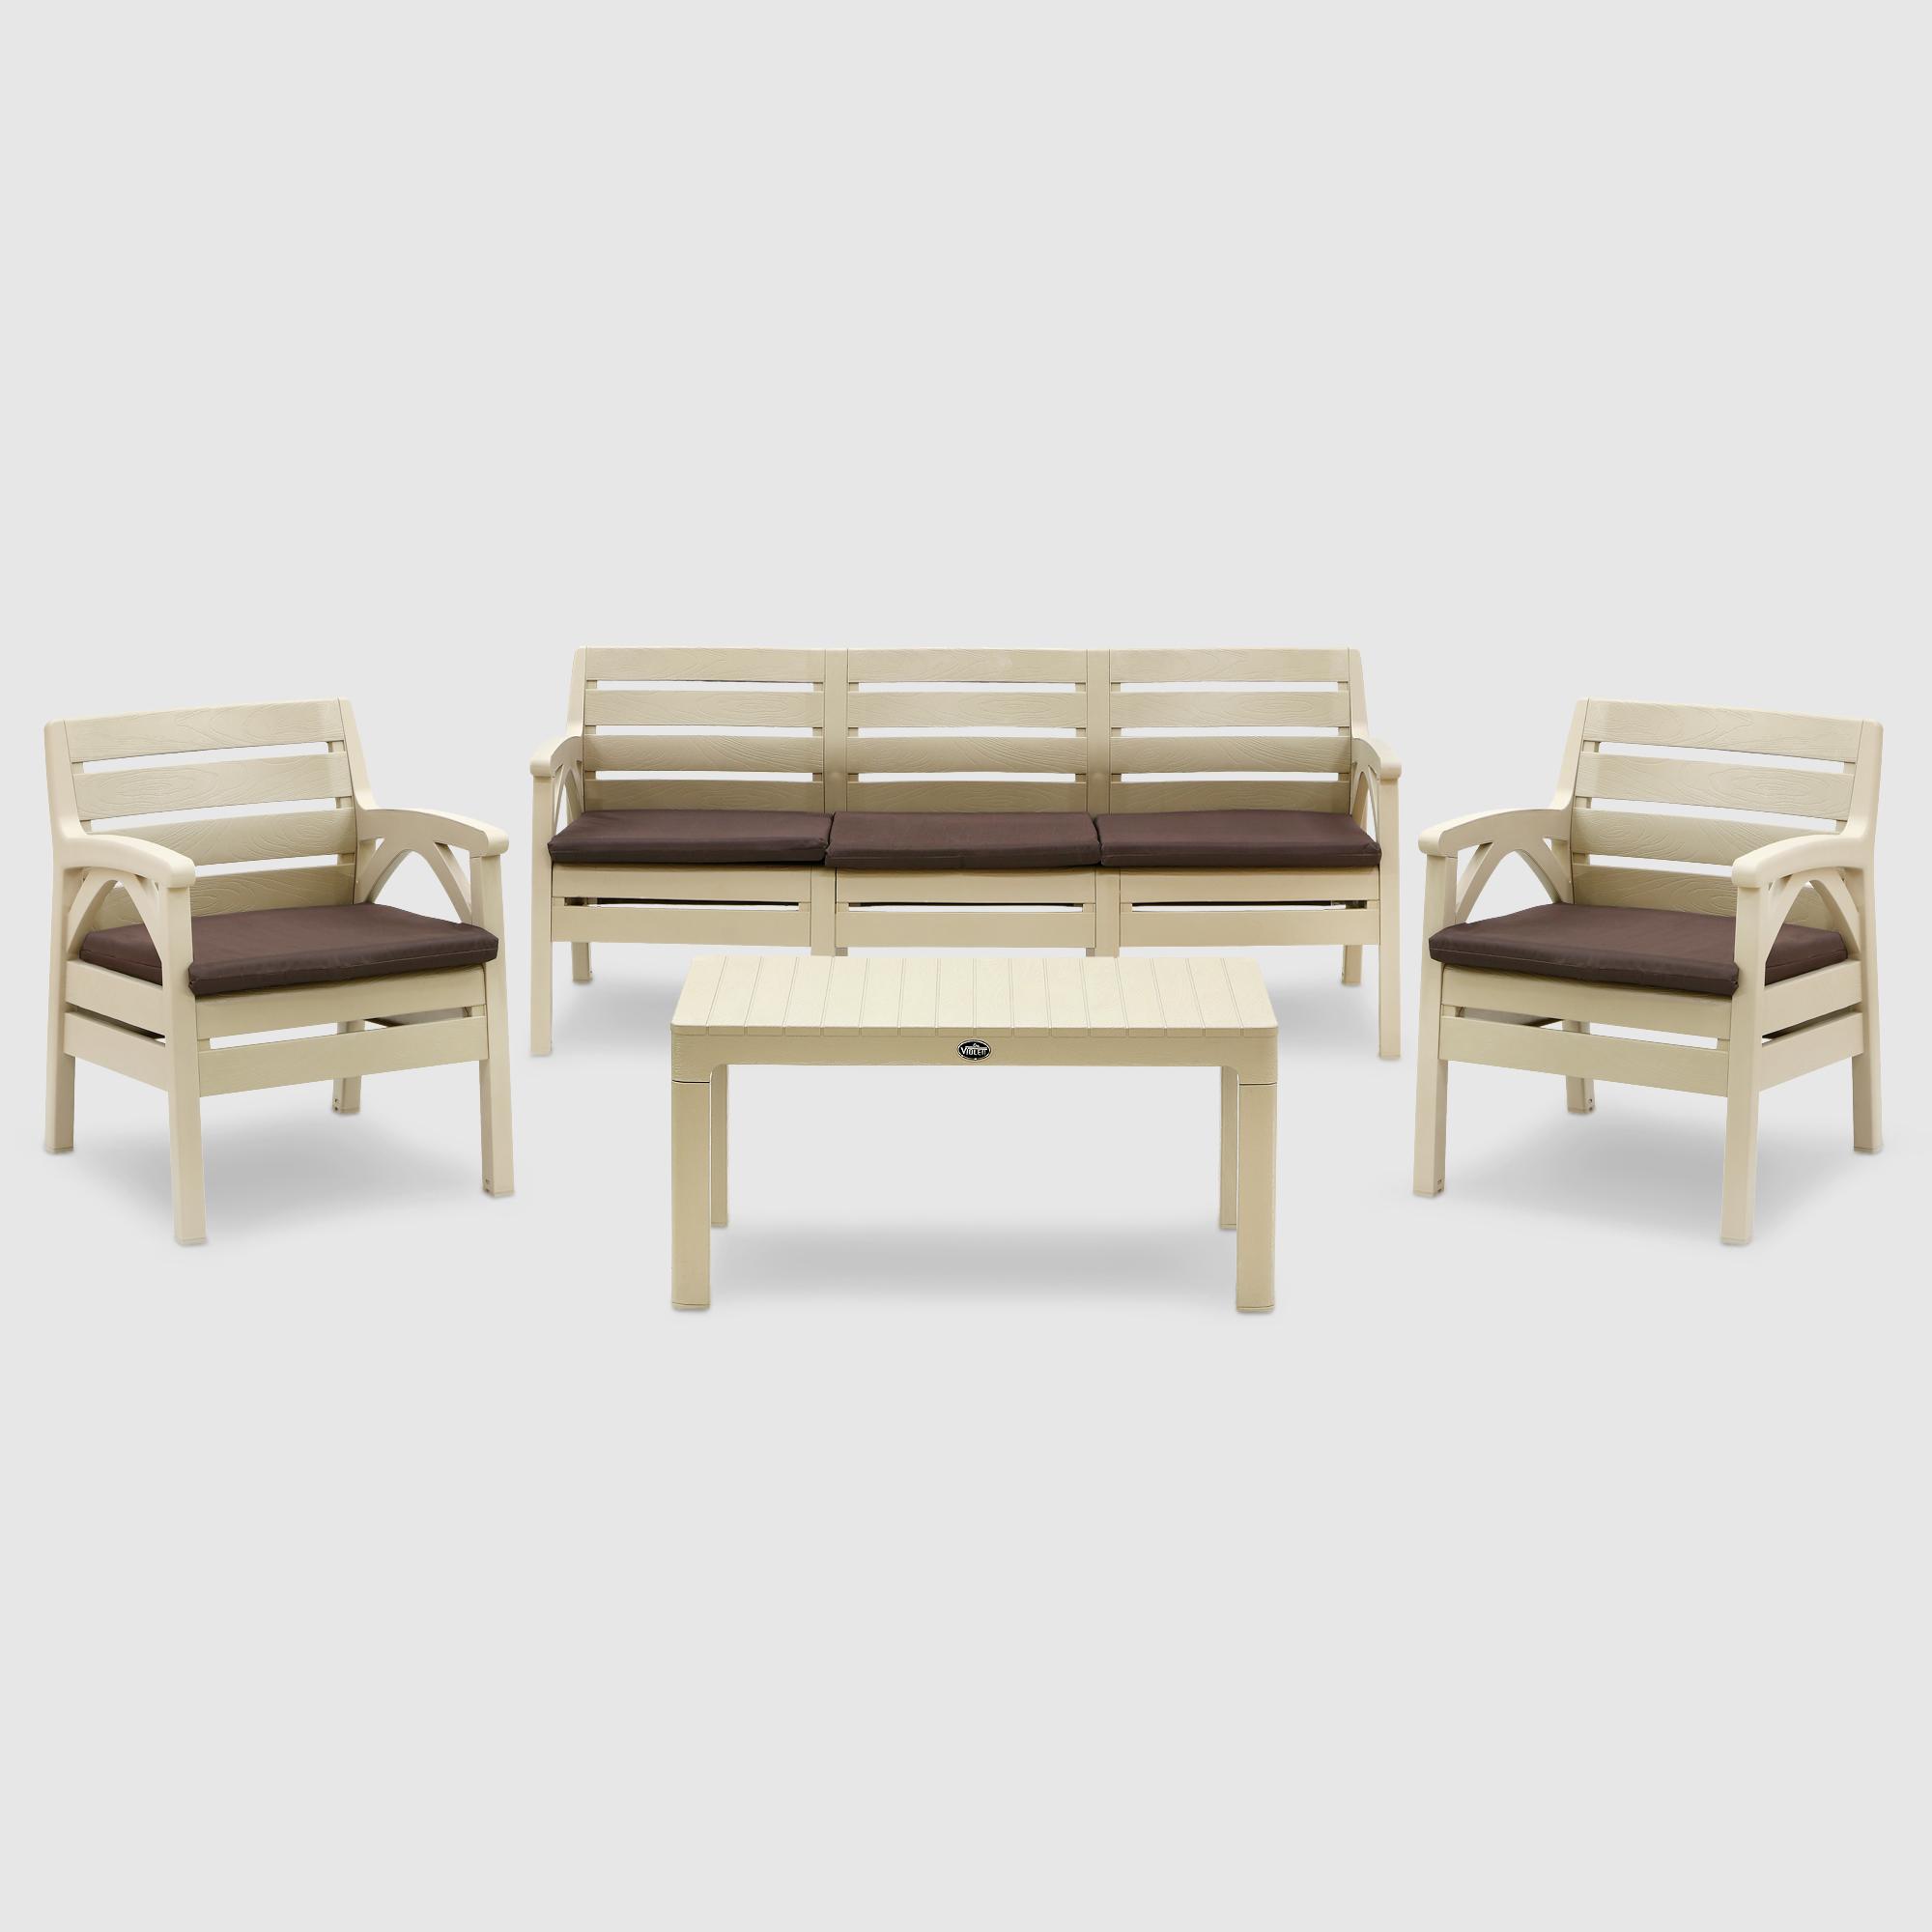 Комплект мебели Violet house santana капучино 4 предмета